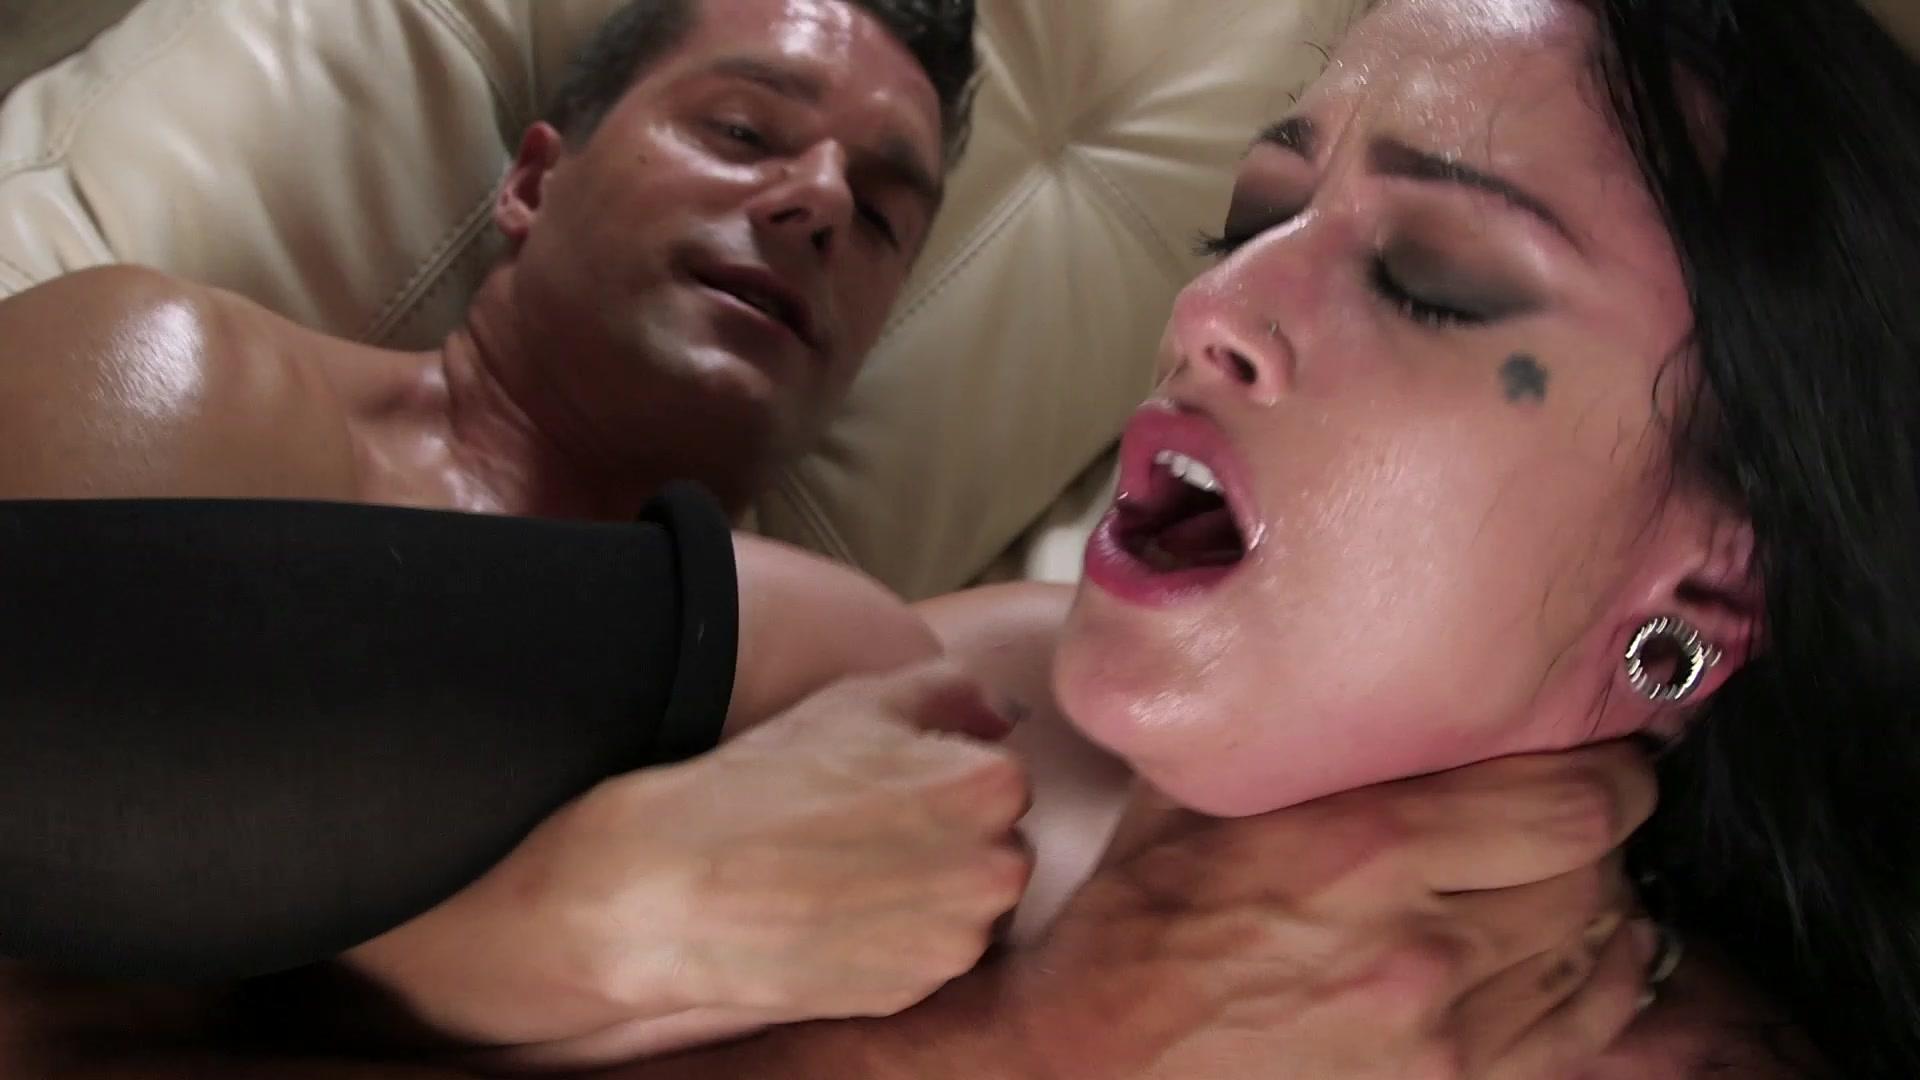 Scene 1 - Beautiful Dark Haired and Tattooed Babe Katrina Jade Takes the Big Cock  Starring:  Ramon Nomar  Katrina Jade